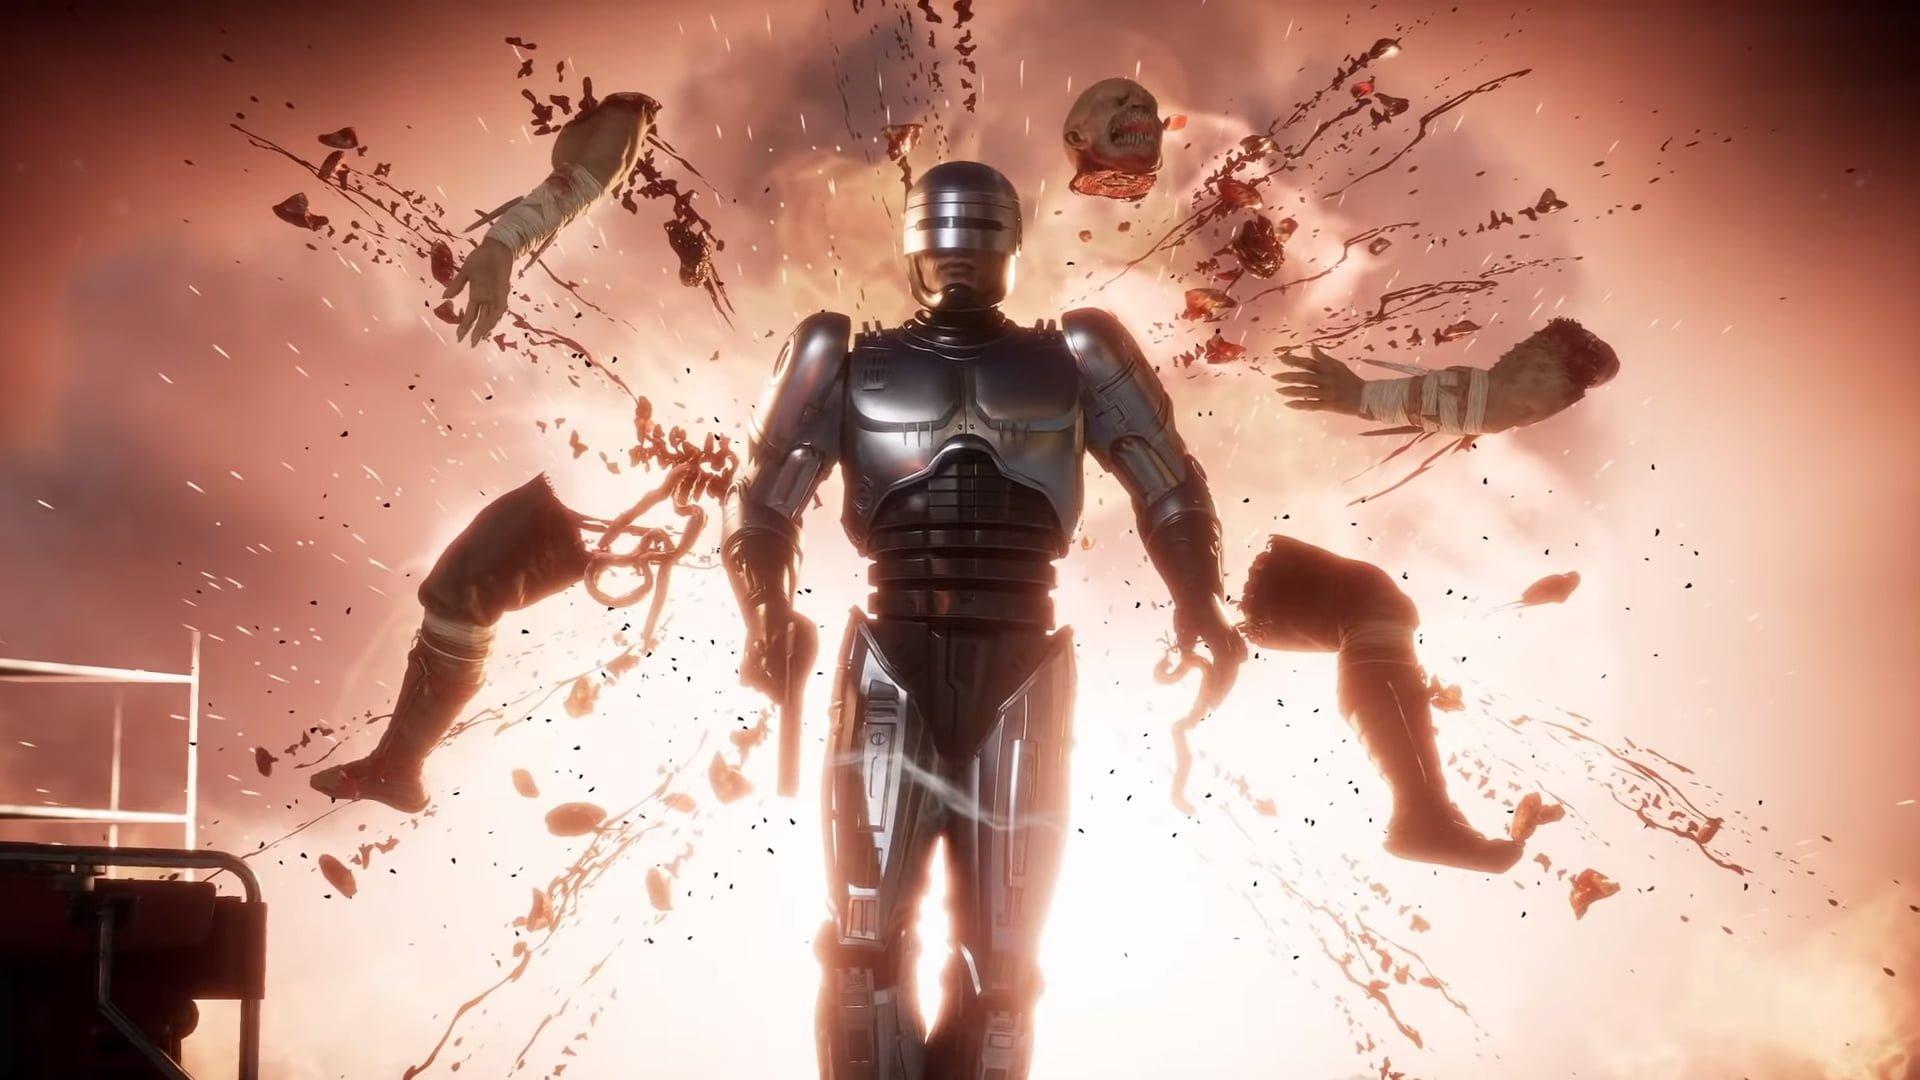 Aspettando Mortal Kombat 11 Ultimate - Top 10 Personaggi Ospite 5 - Hynerd.it